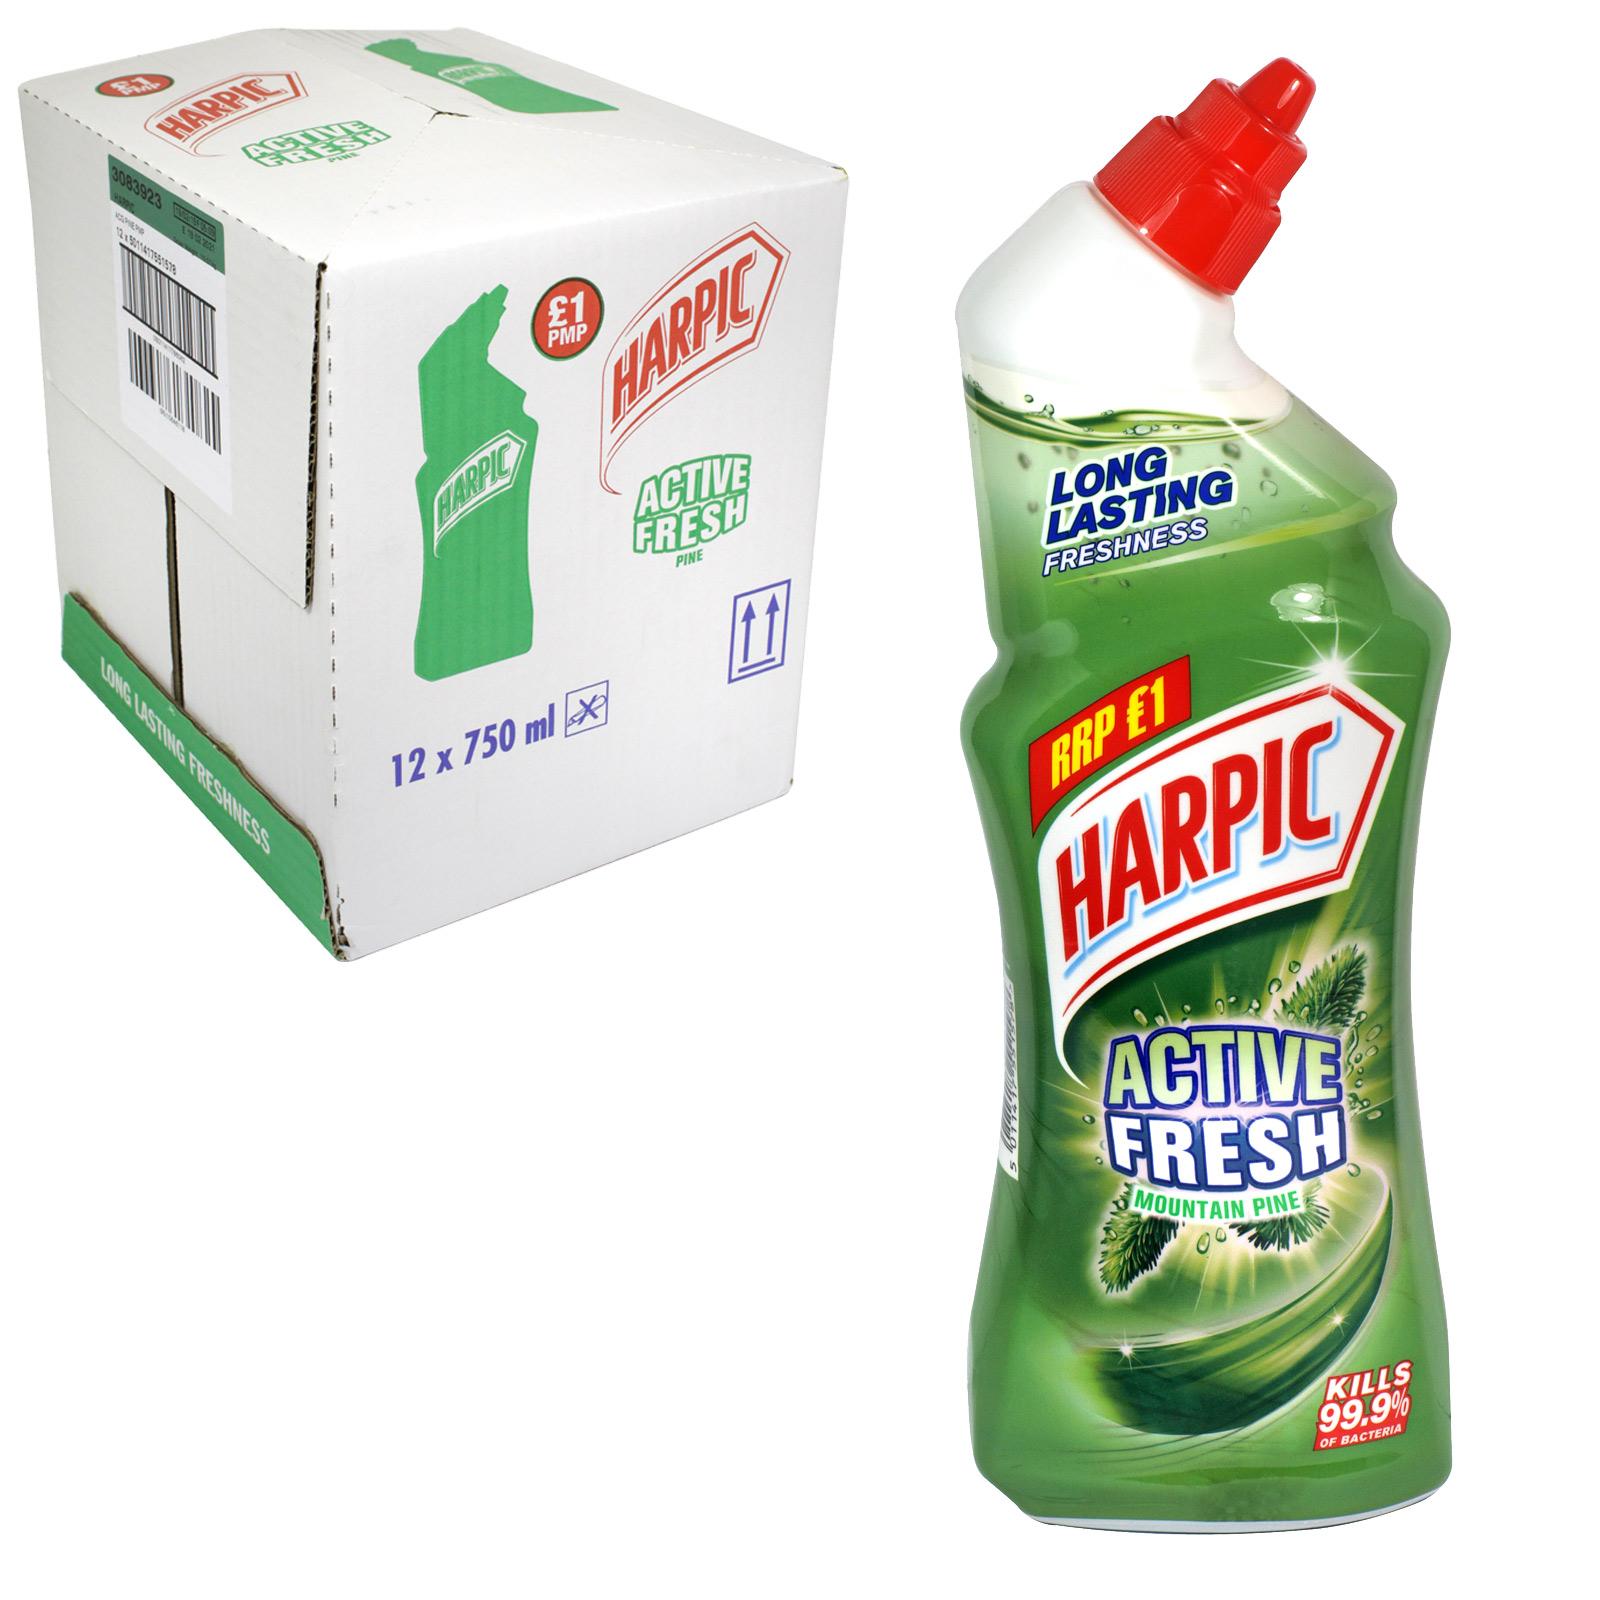 HARPIC ACT CLEAN GEL 750M PINE PM ?1 X12